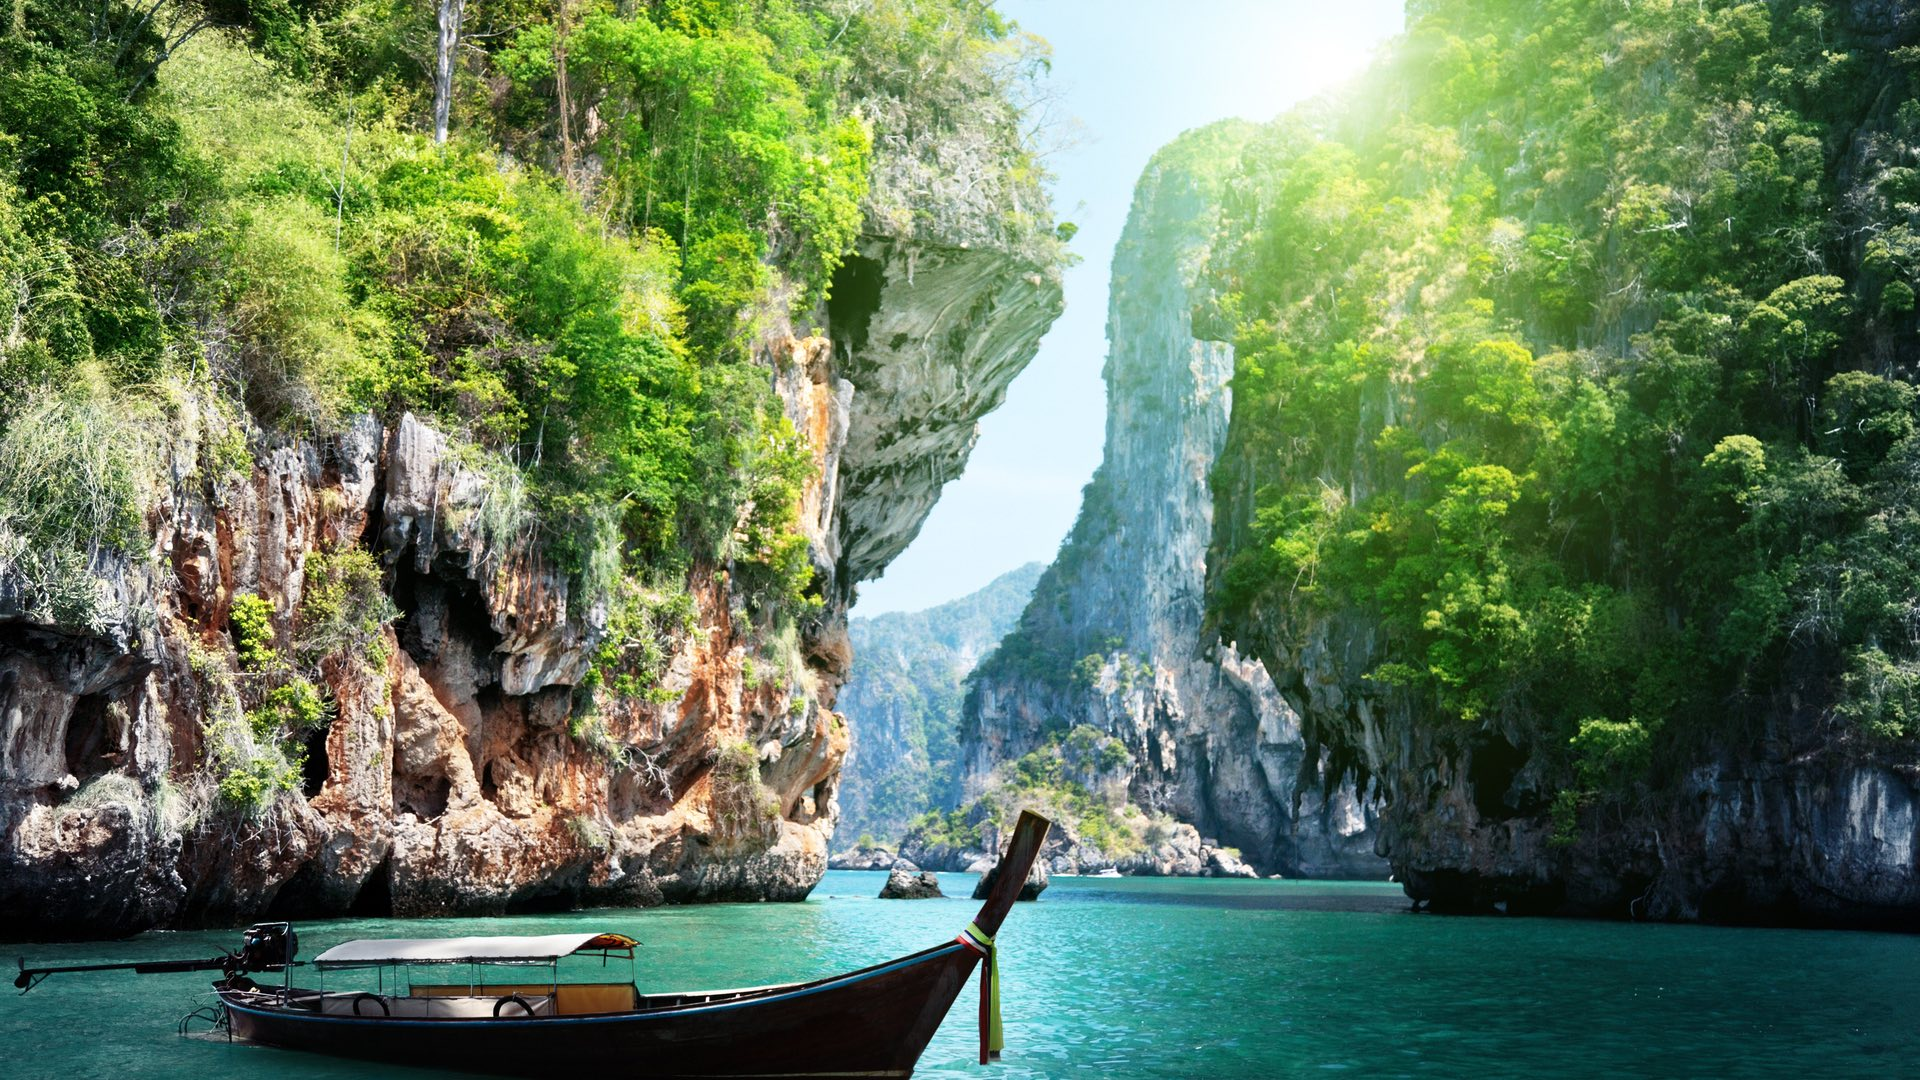 Thailand |Krabi | ©ESB Professional/Shutterstock.com